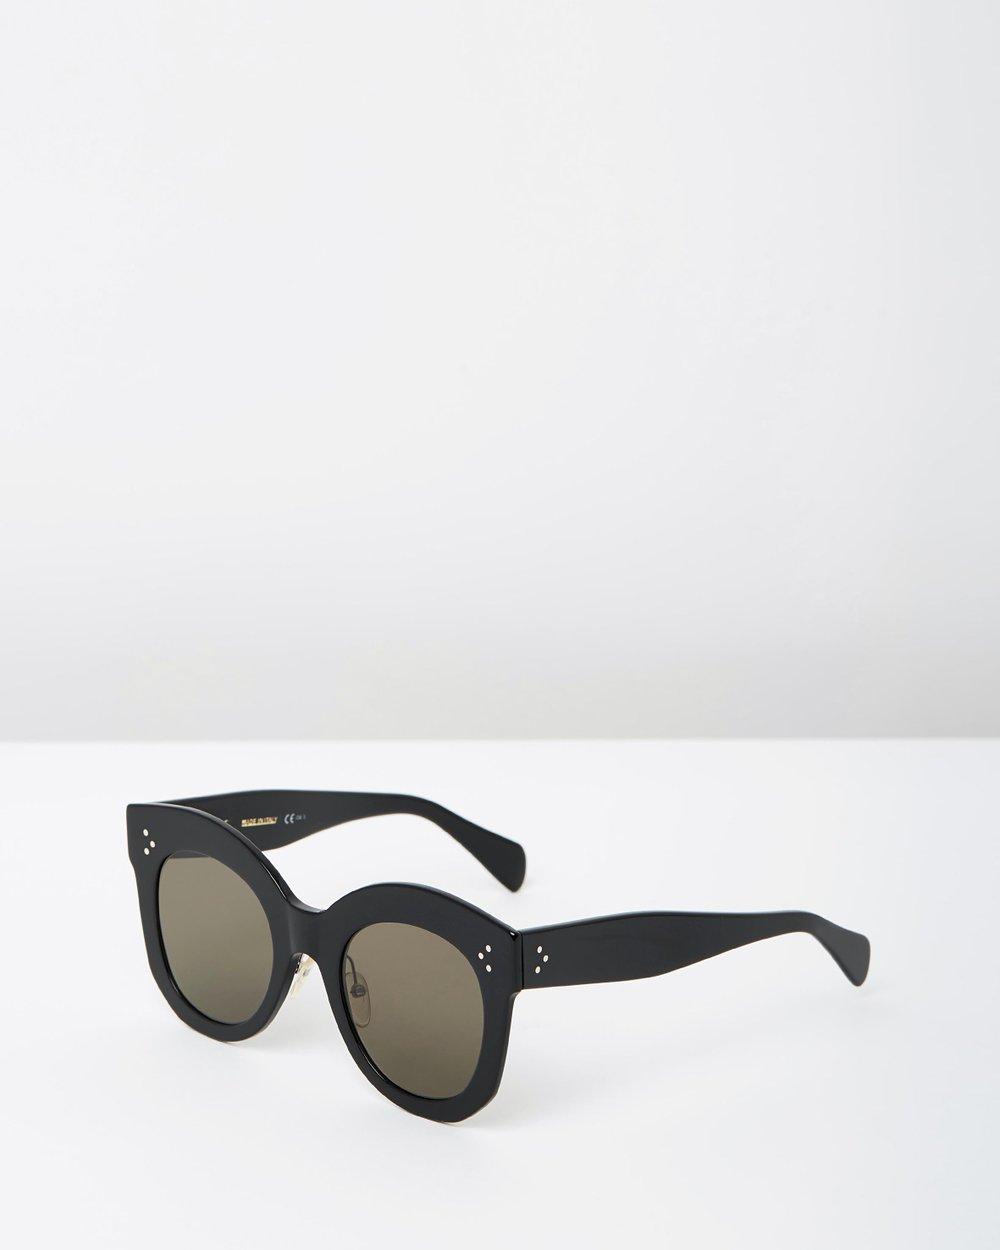 4b8660eac4 CL41443 Sunglasses by CELINE Online